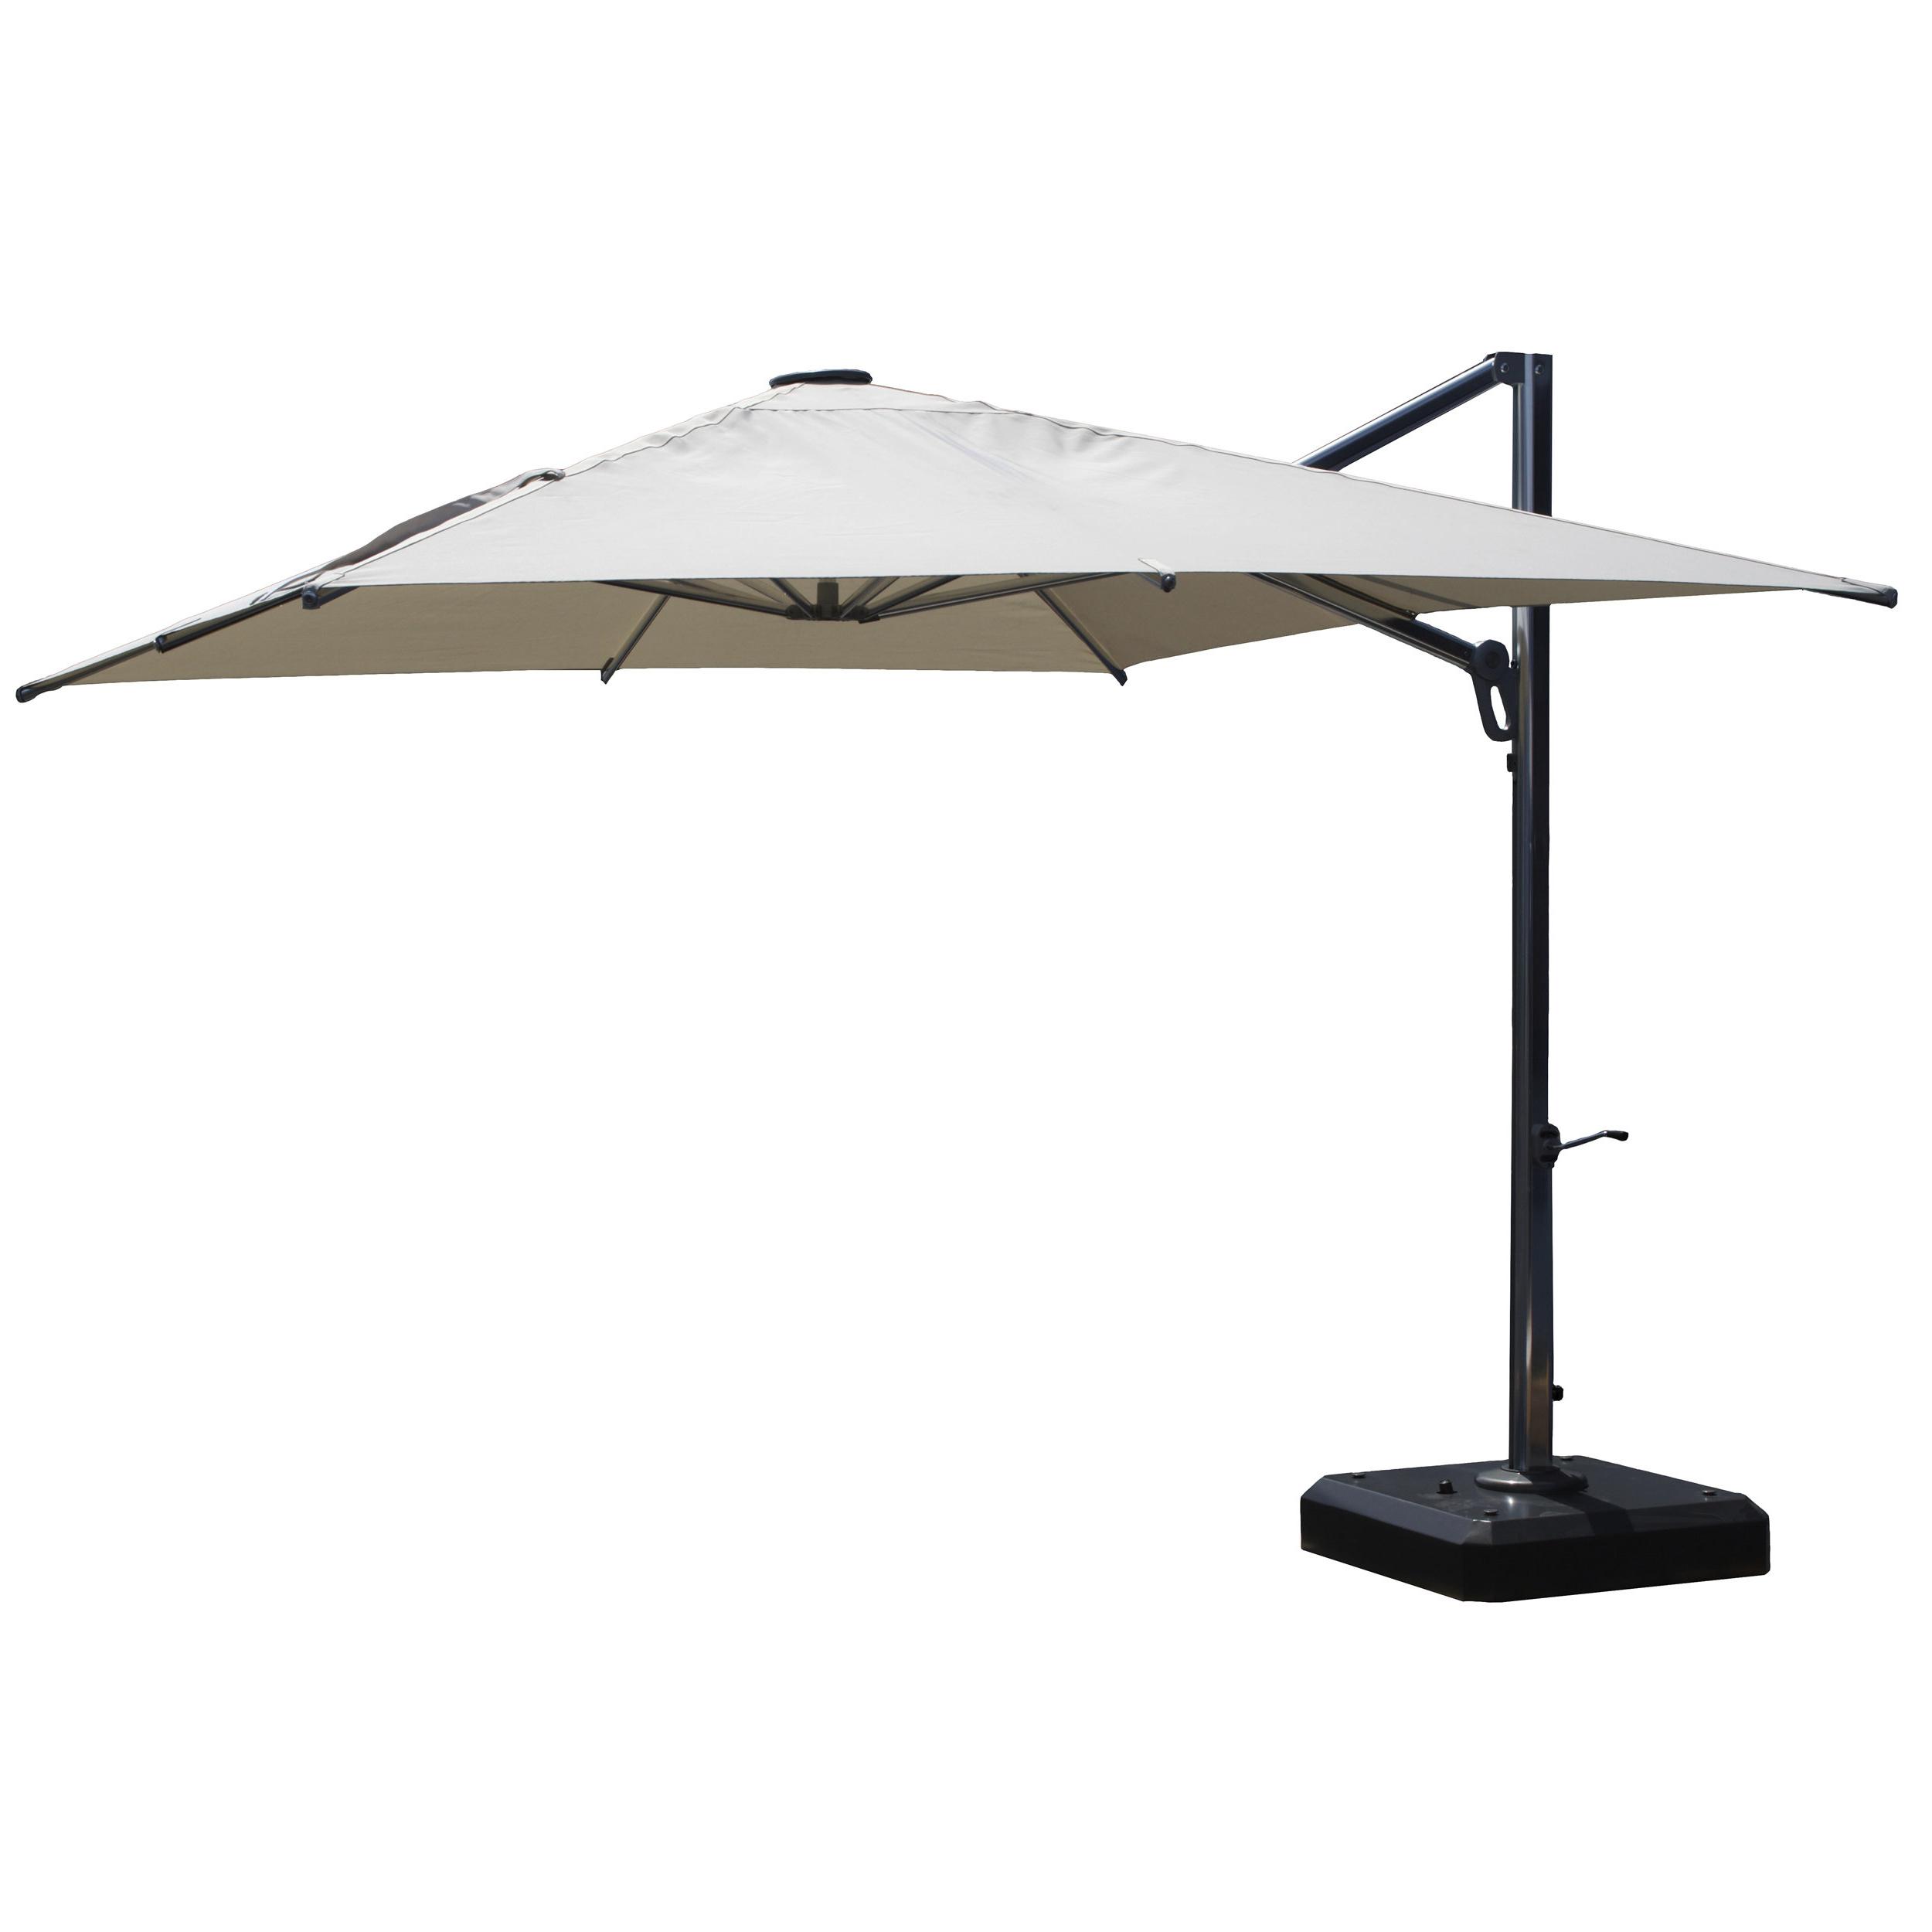 10' Square Cantilever Umbrella For Trendy Carlisle Square Cantilever Sunbrella Umbrellas (View 1 of 20)